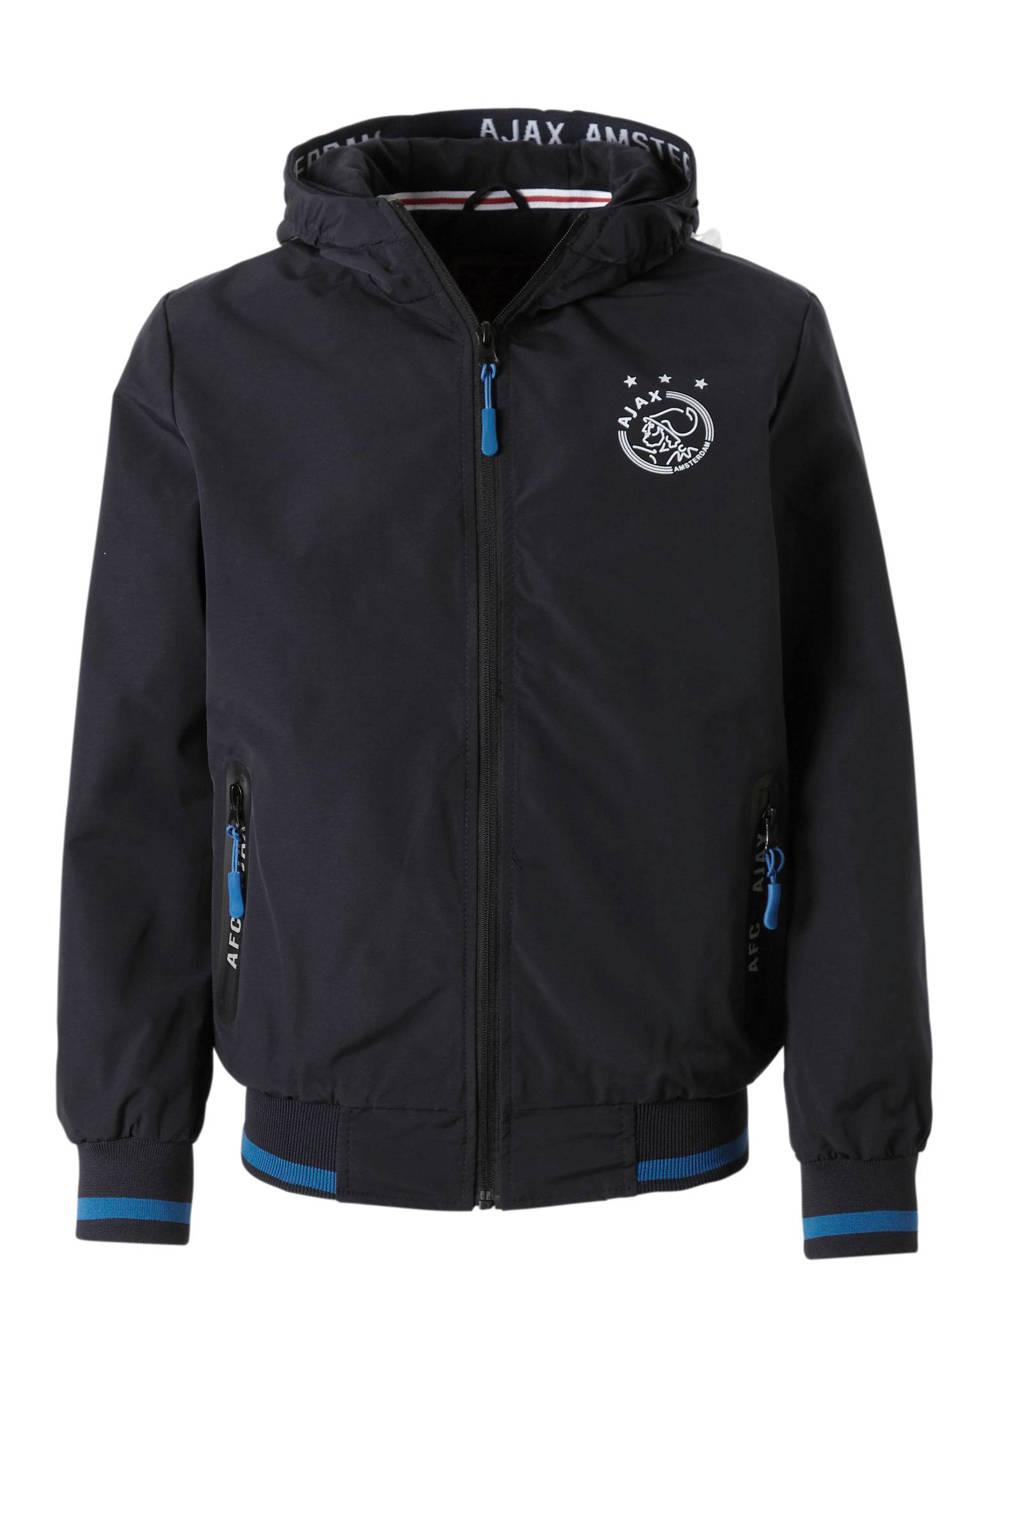 Ajax zomerjas donkerblauw, Donkerblauw